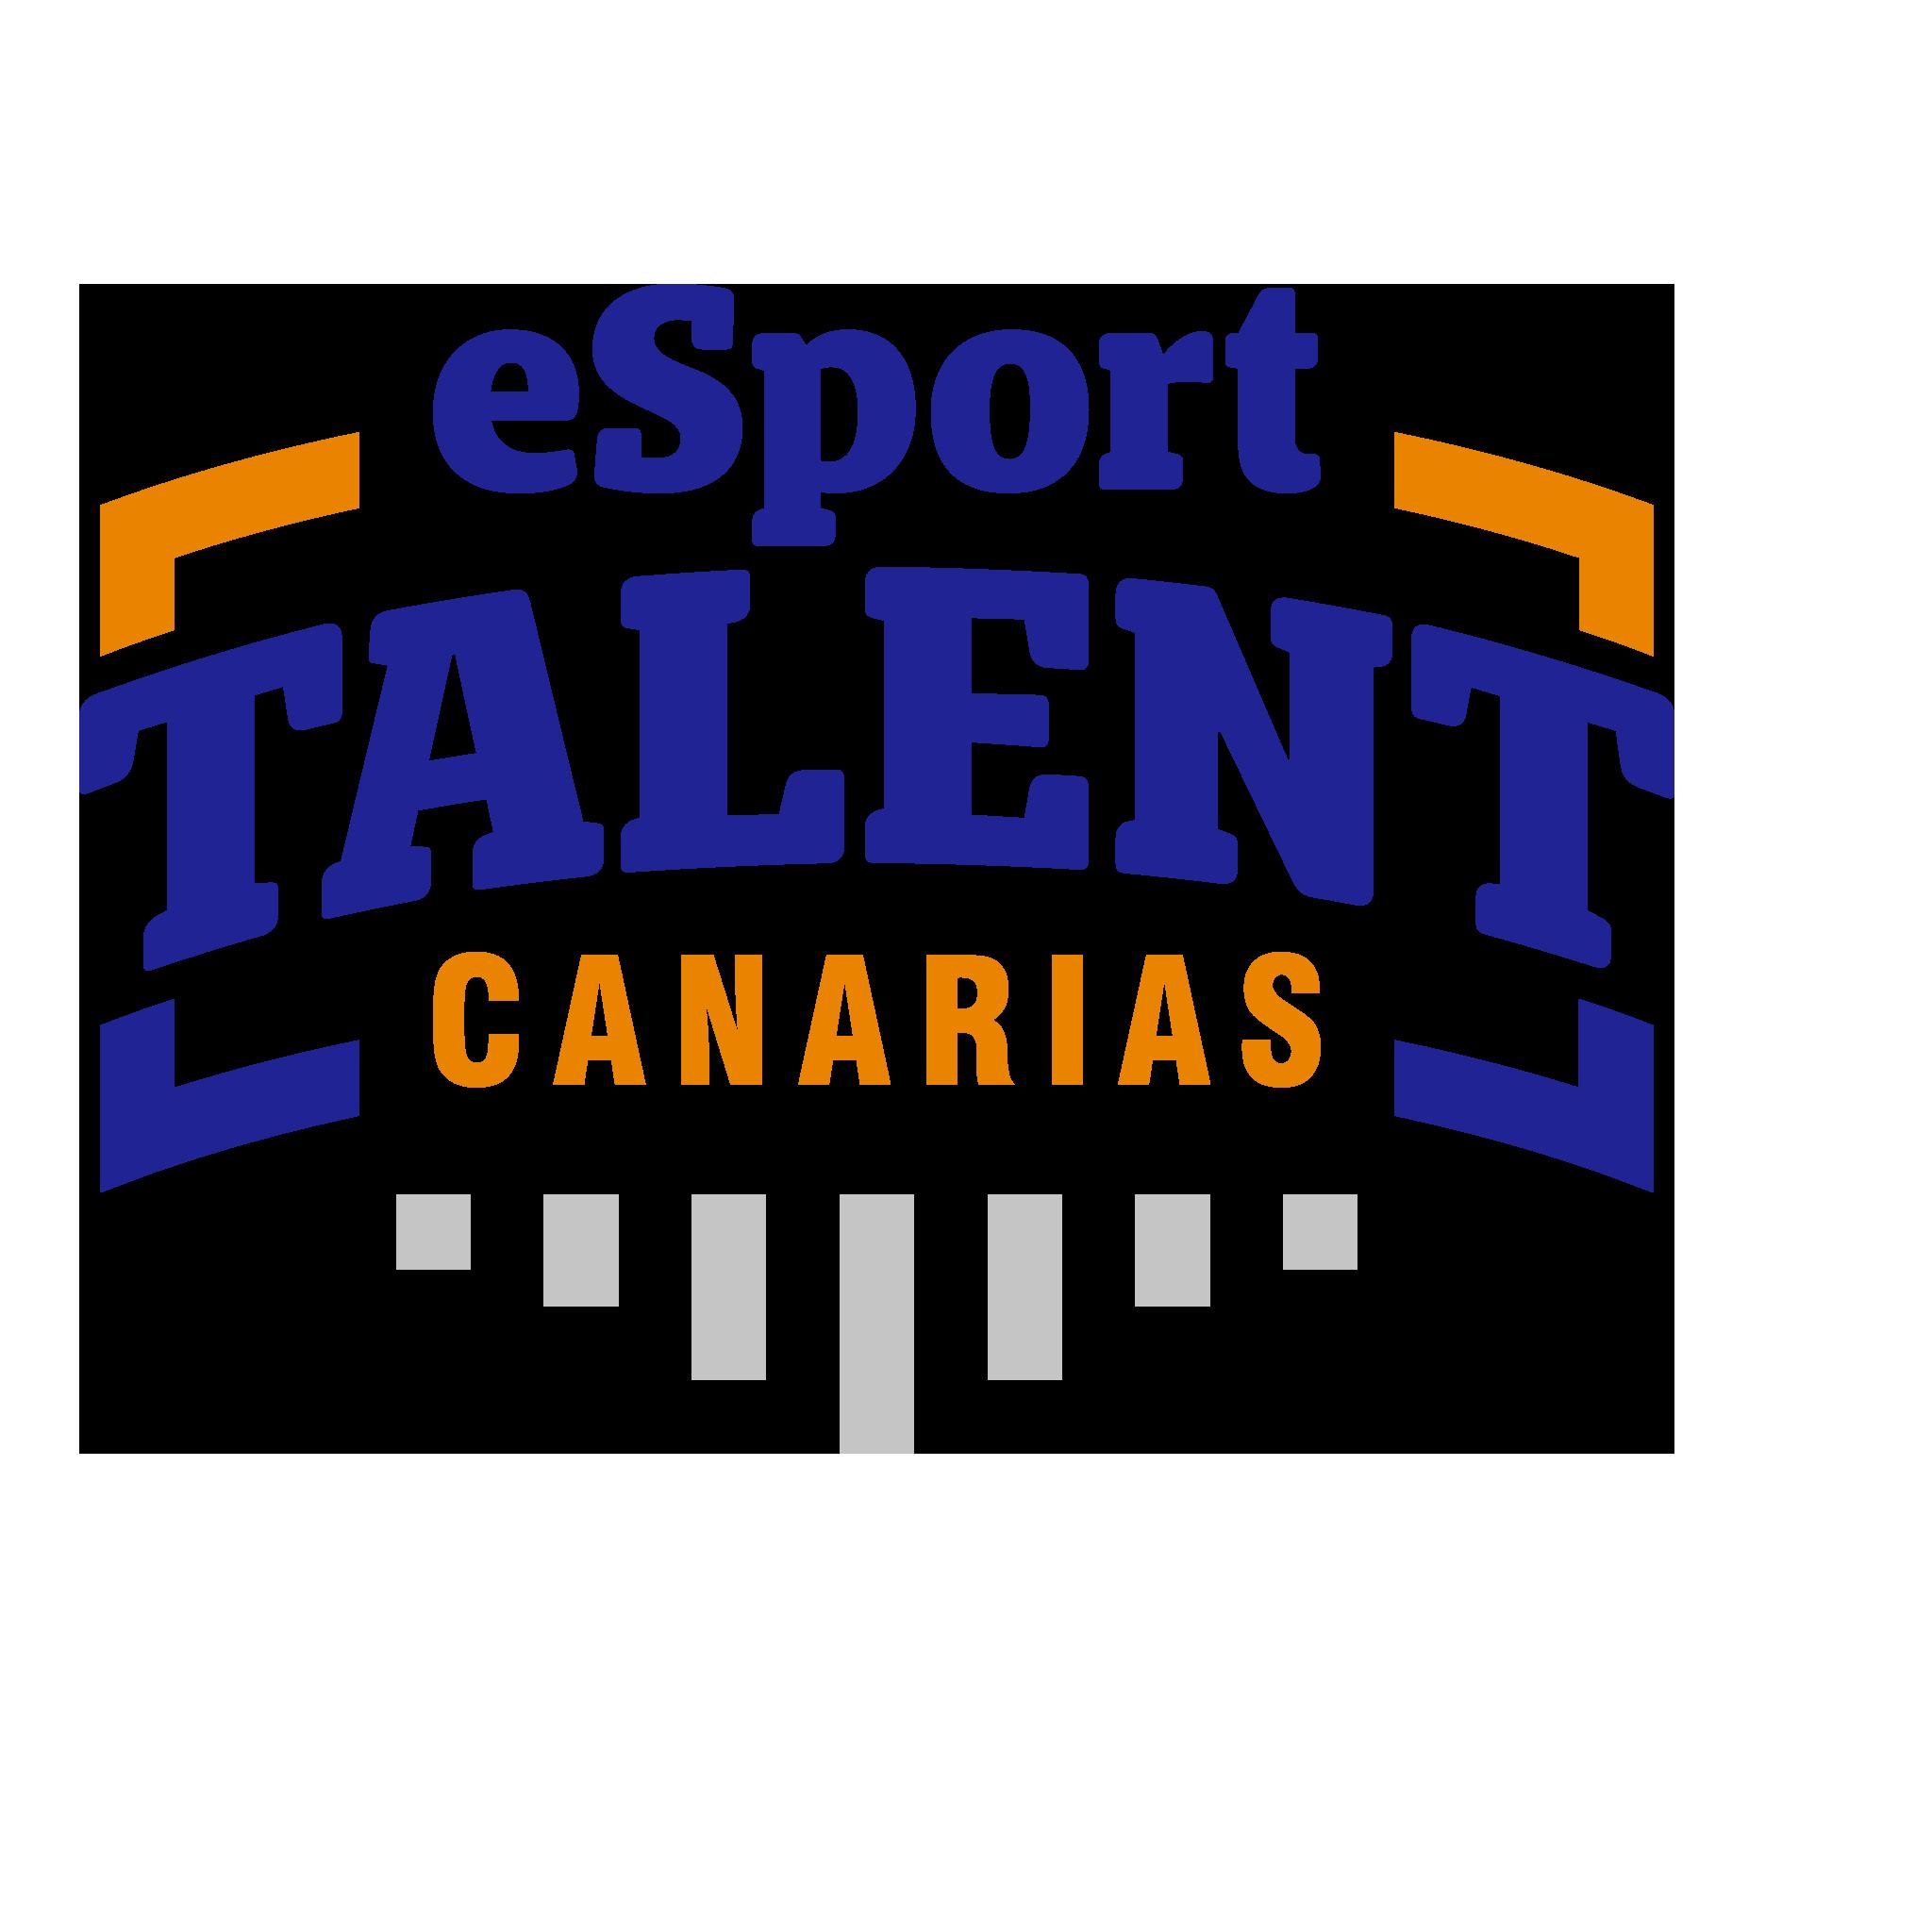 eSporttalentcanarias